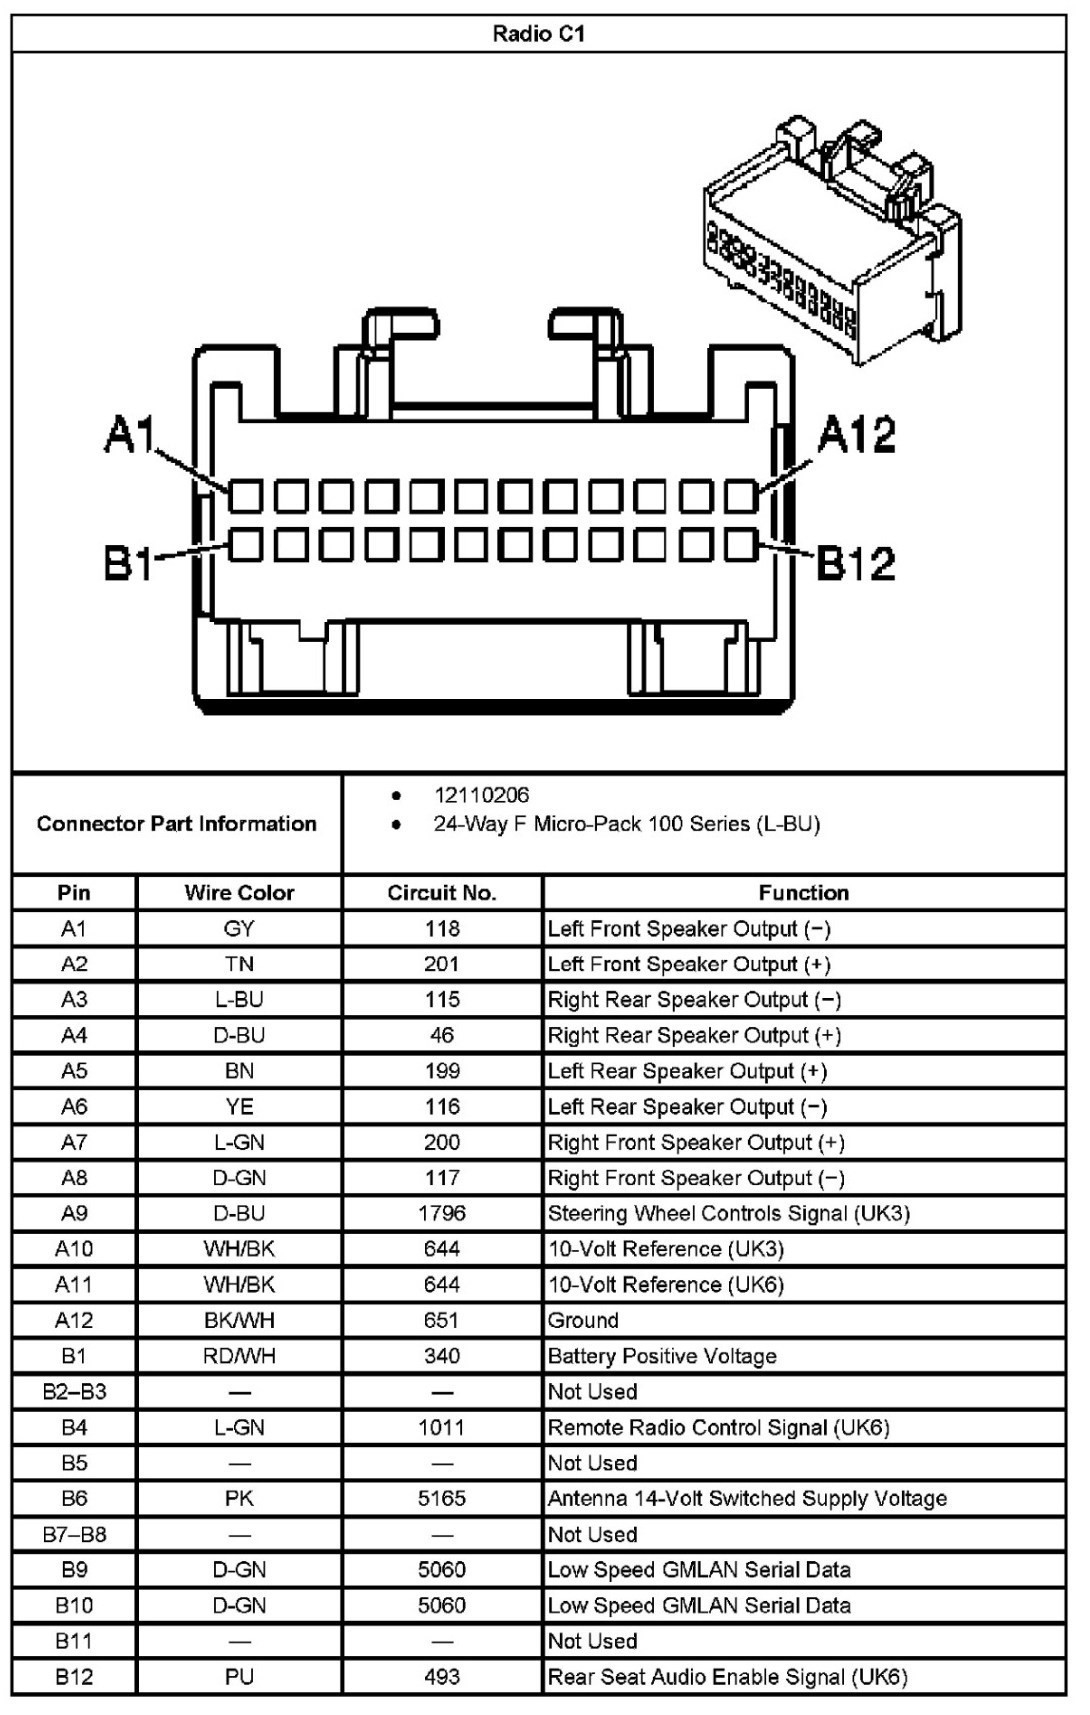 Wiring Diagram For 2004 Tahoe - Wiring Diagram Detailed - 2004 Chevy Tahoe Radio Wiring Diagram